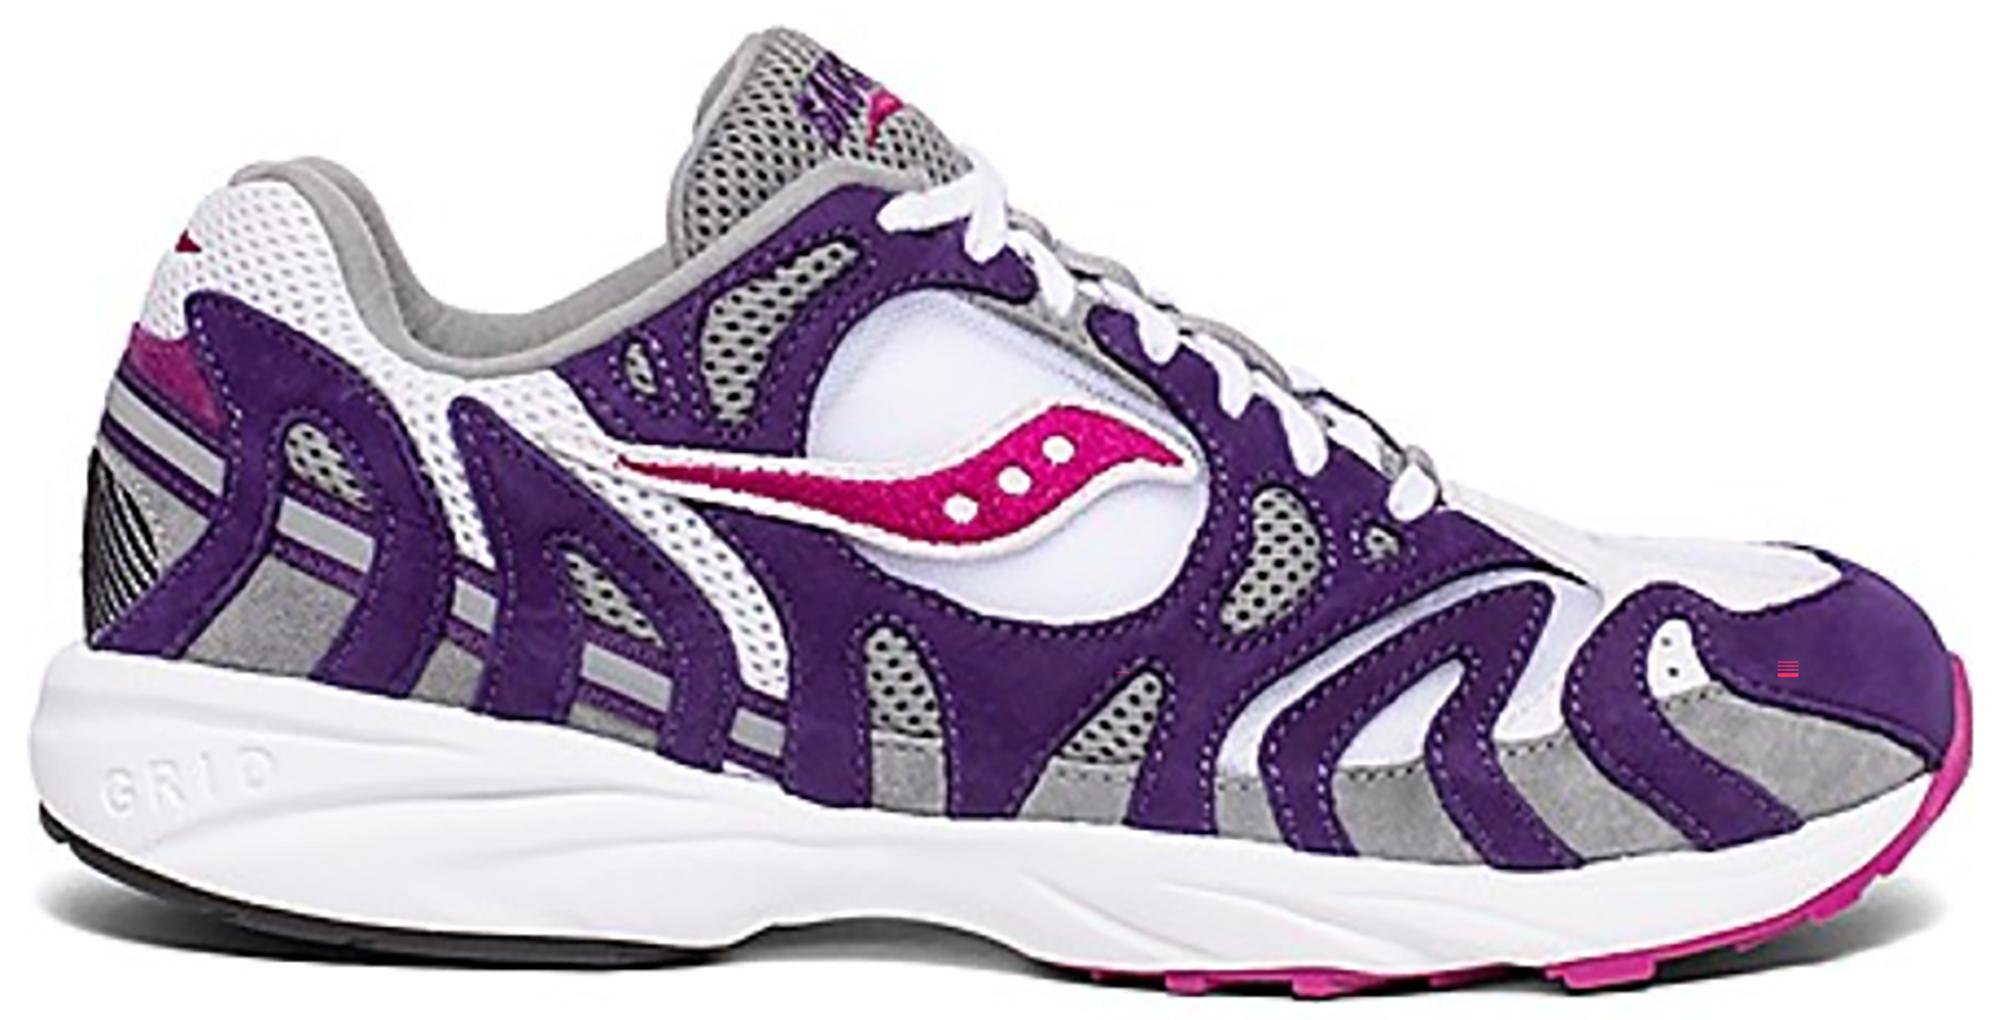 Saucony Grid Azura 2000 Purple - S70491-2